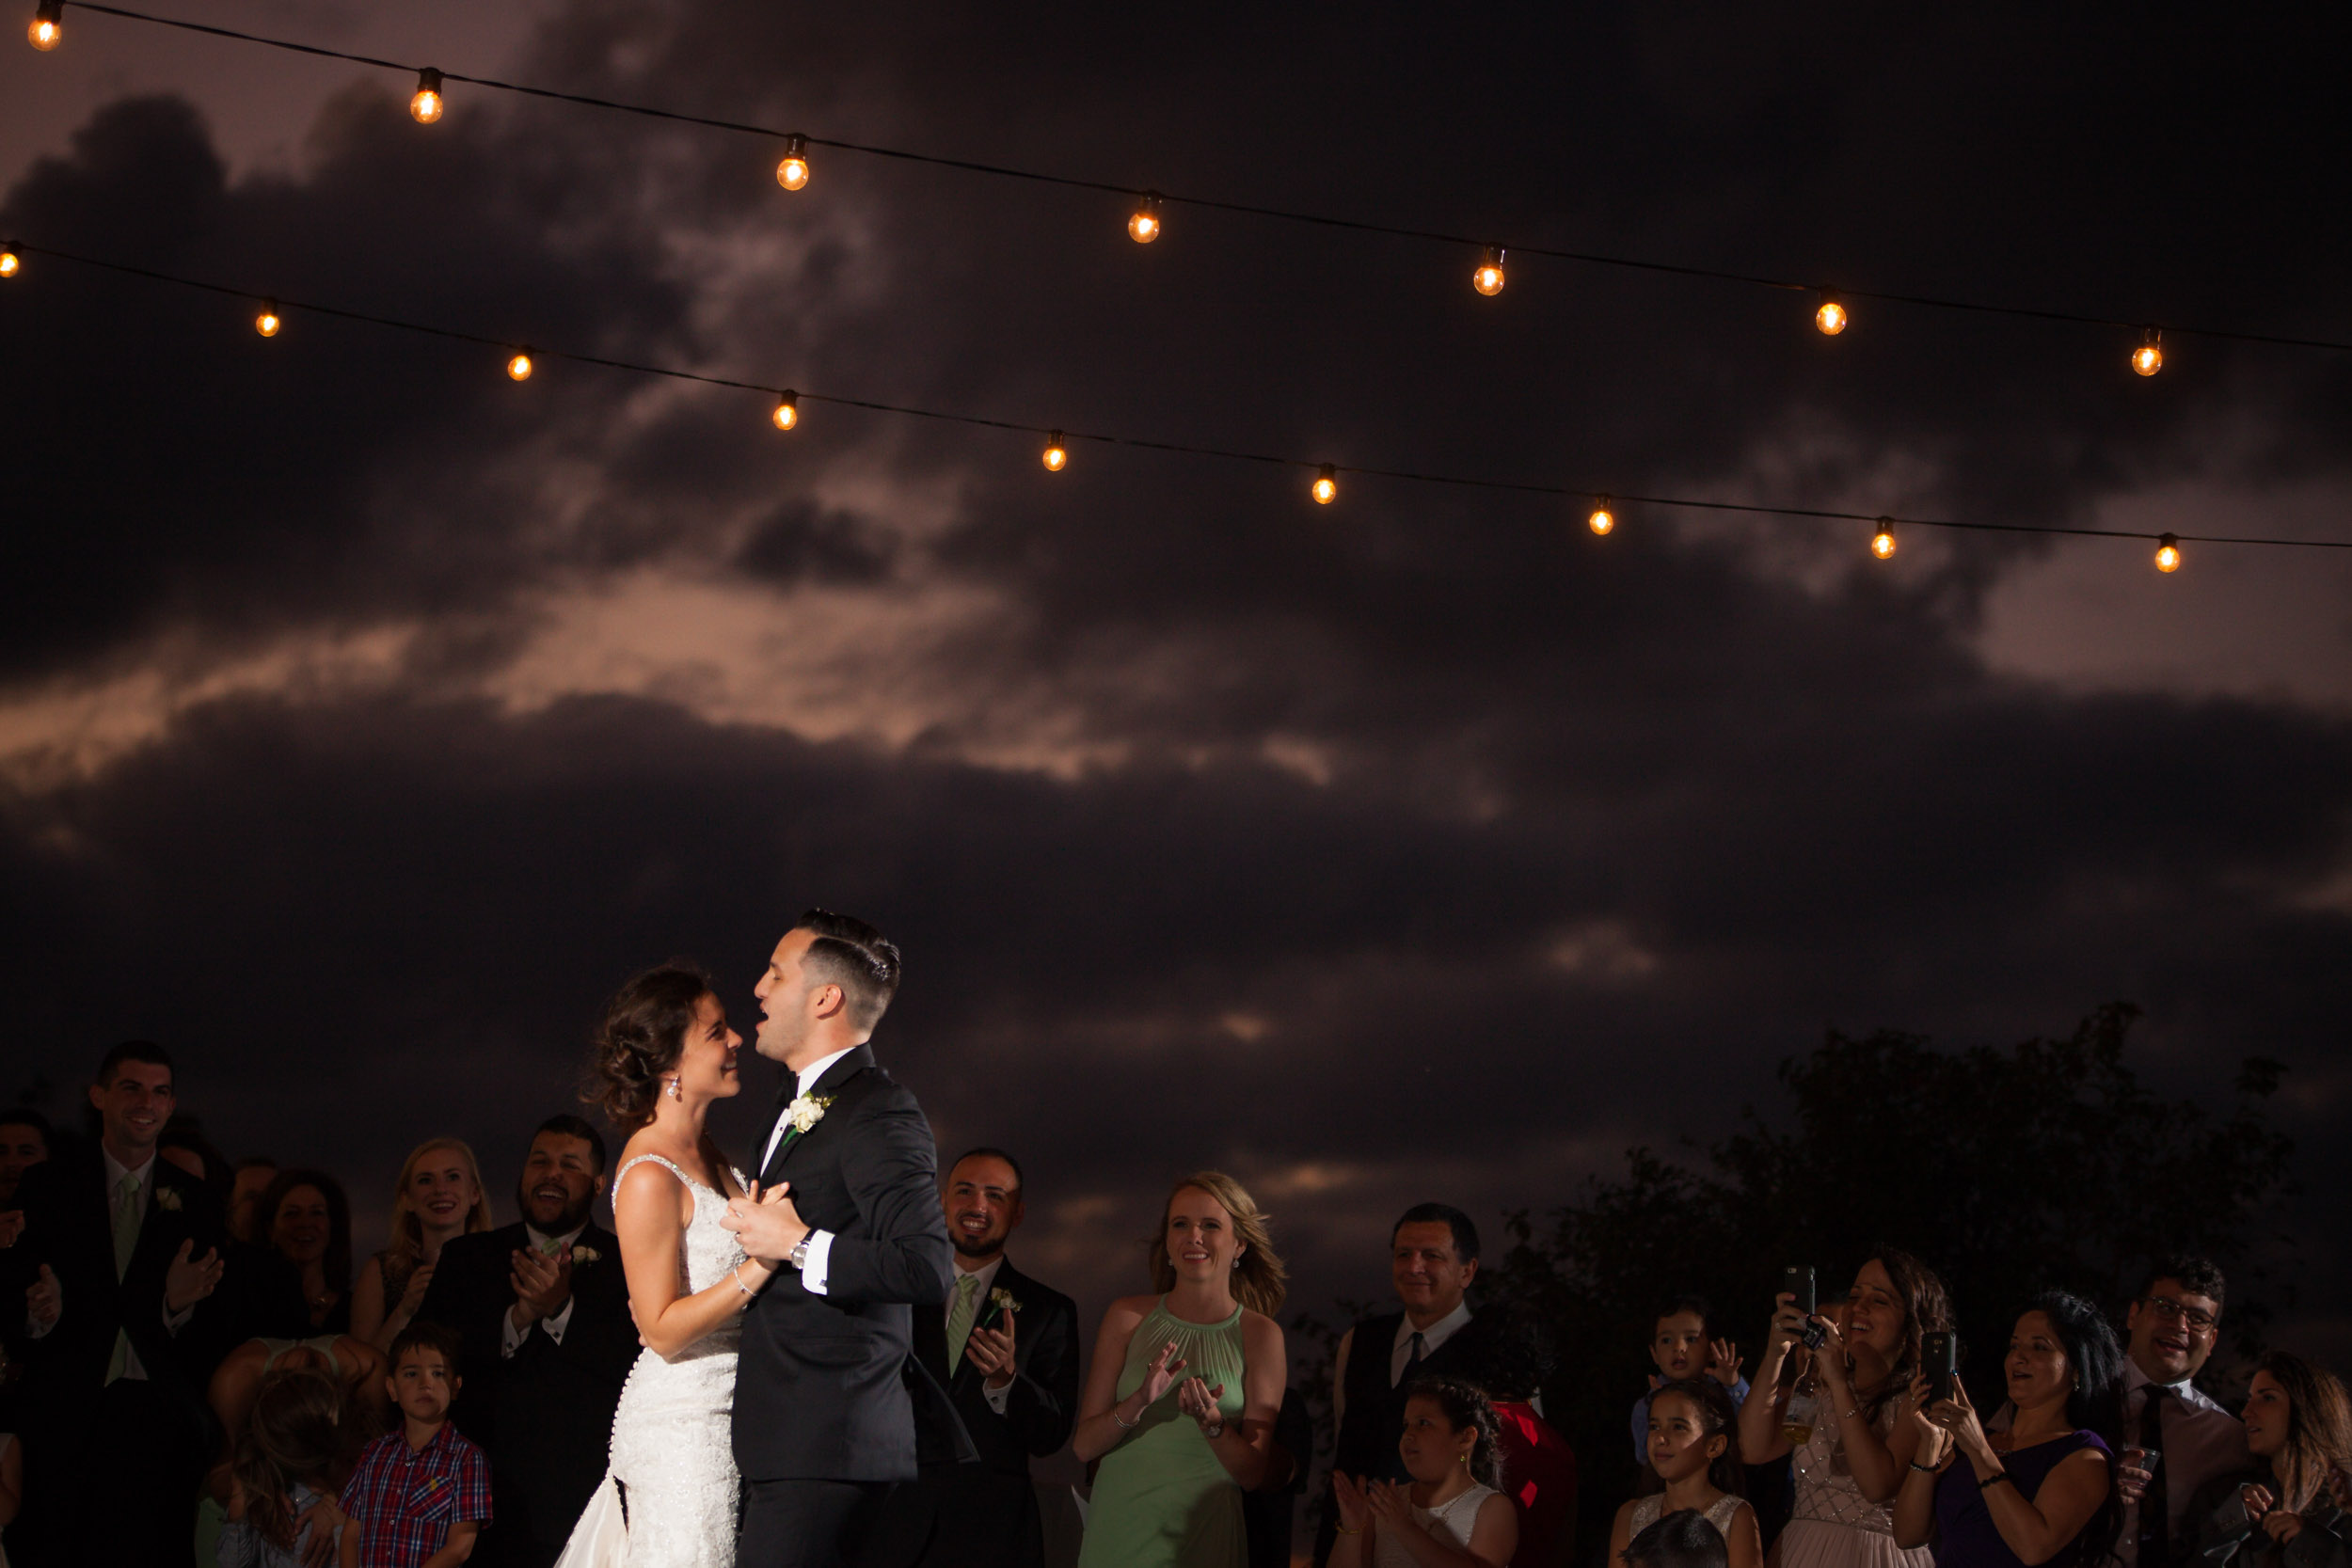 Flordia-Wedding-Photography-59.jpg